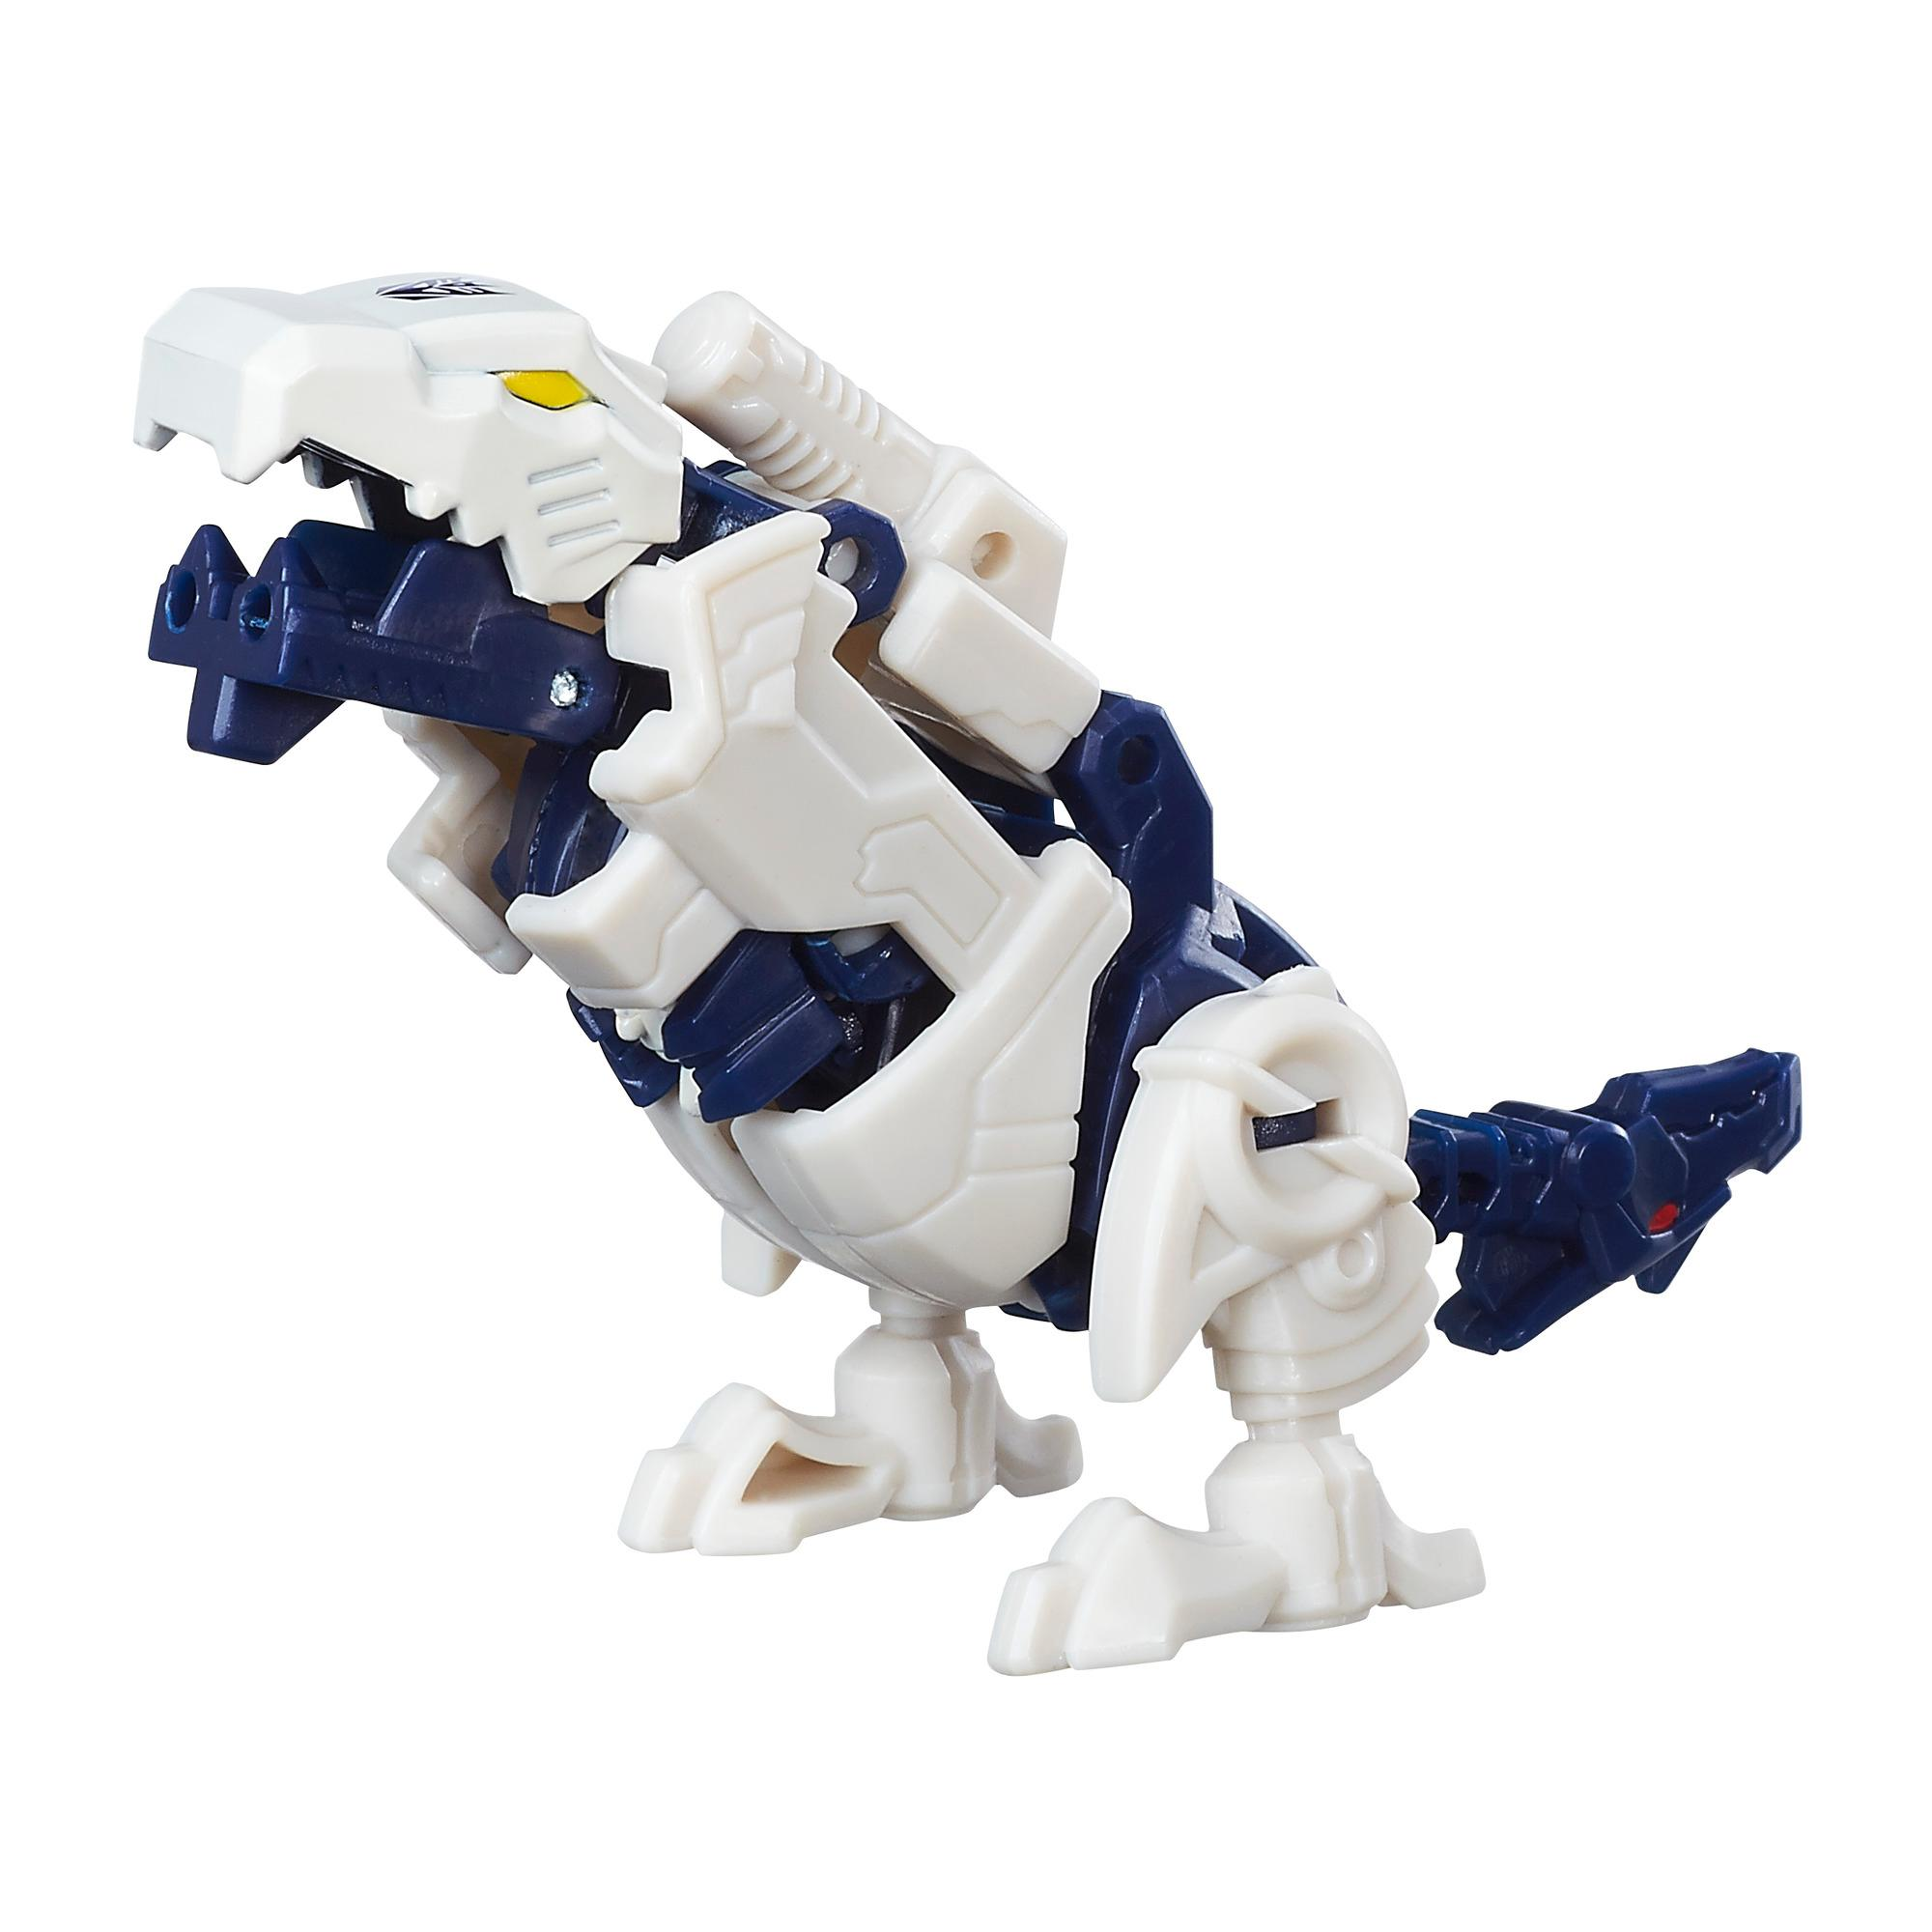 Transformers Generations Titans Return Titan Master Overboard